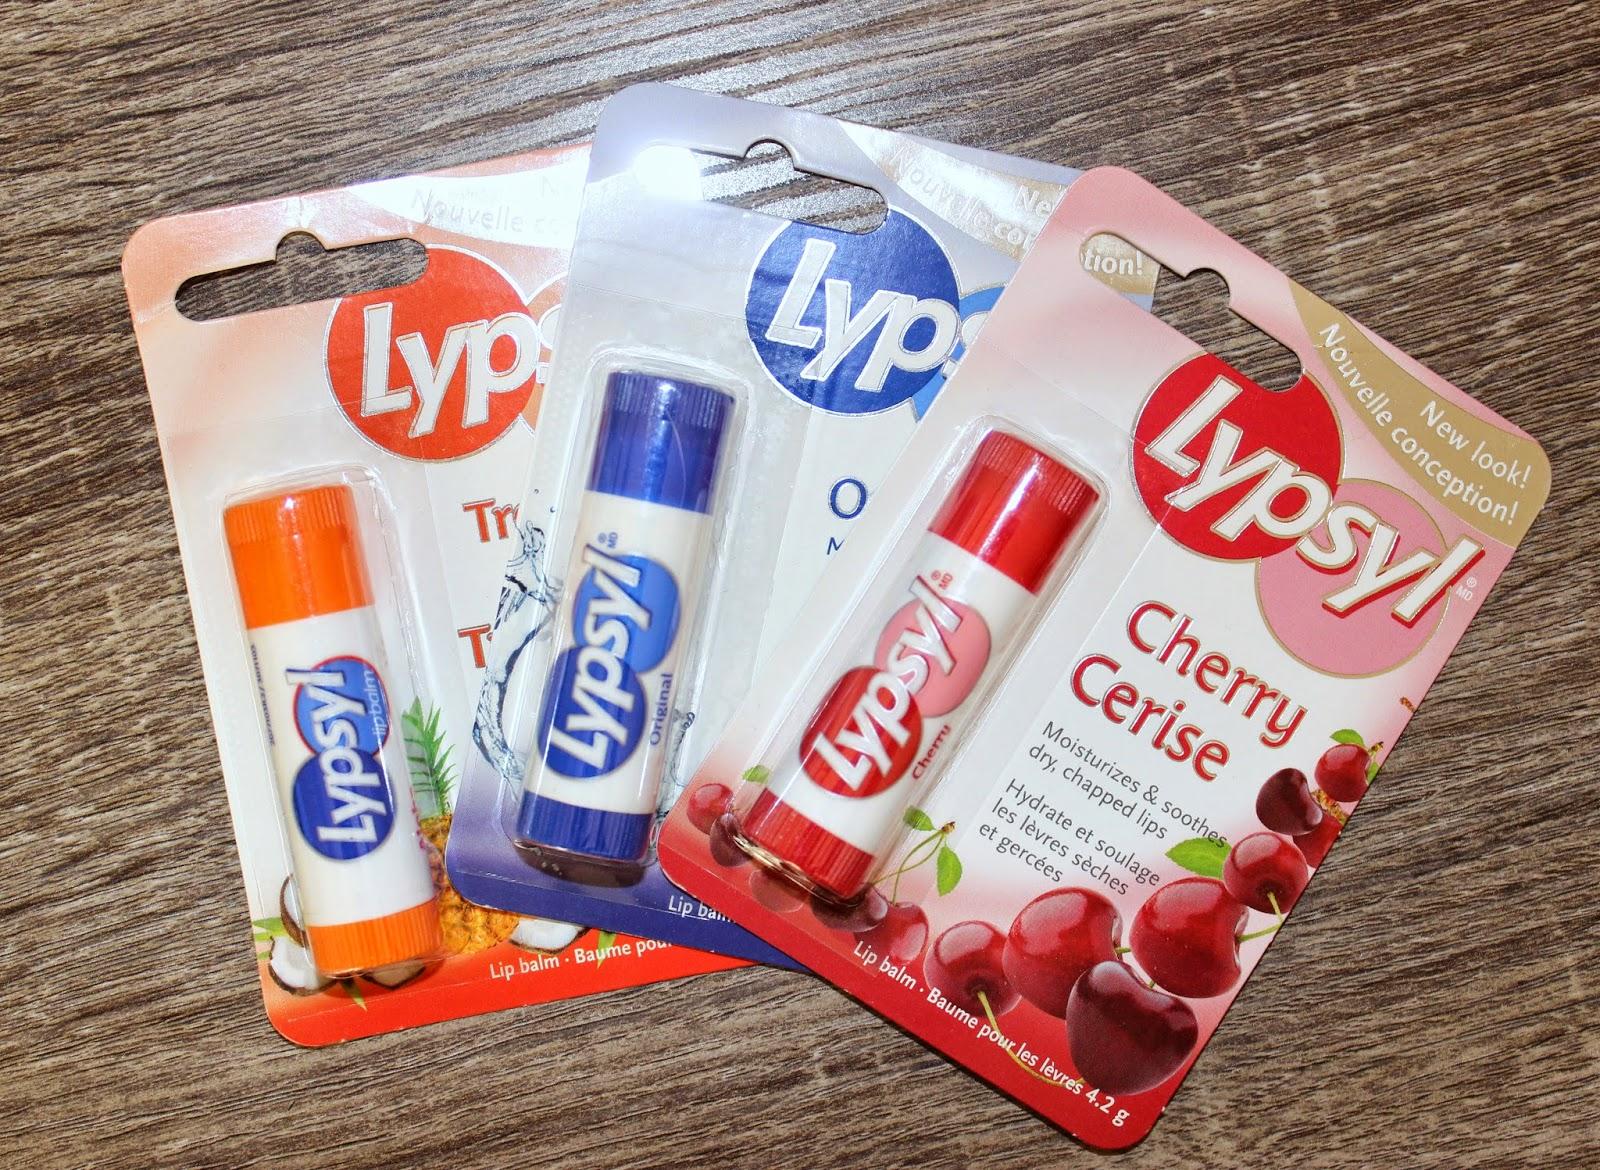 Lypsyl's Lip Balms